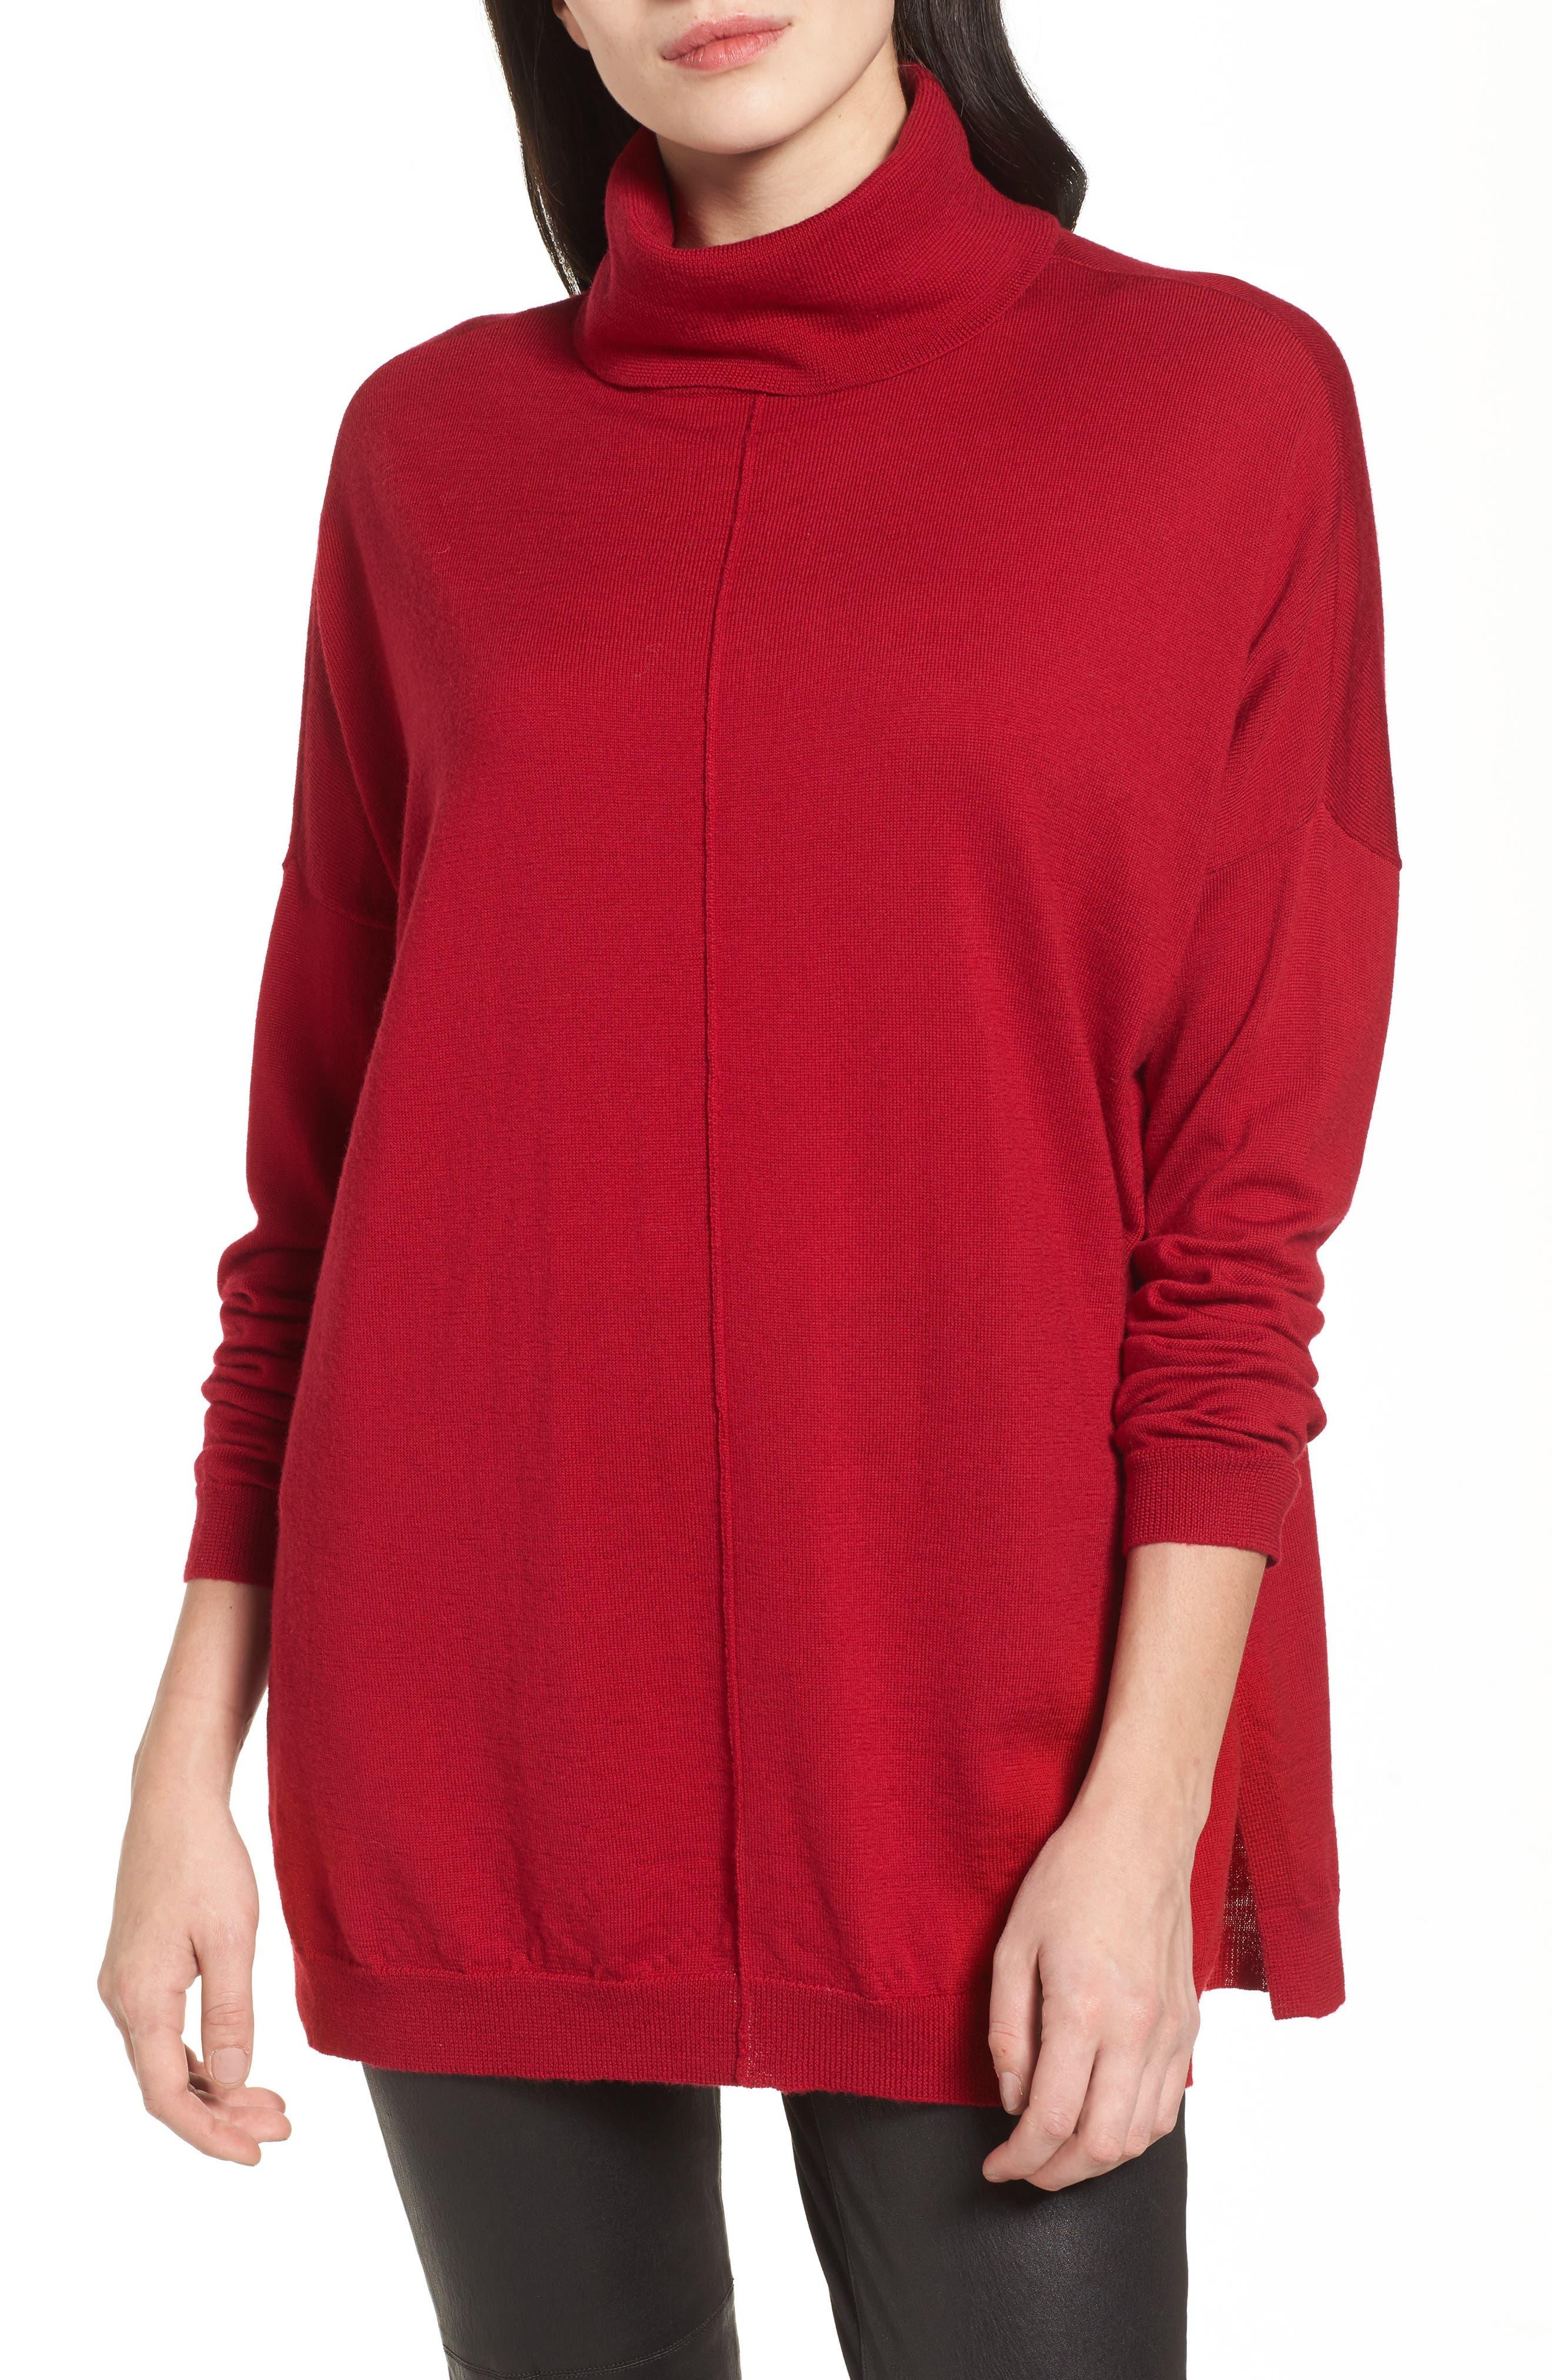 Merino Wool Boxy Turtleneck Sweater,                         Main,                         color, China Red